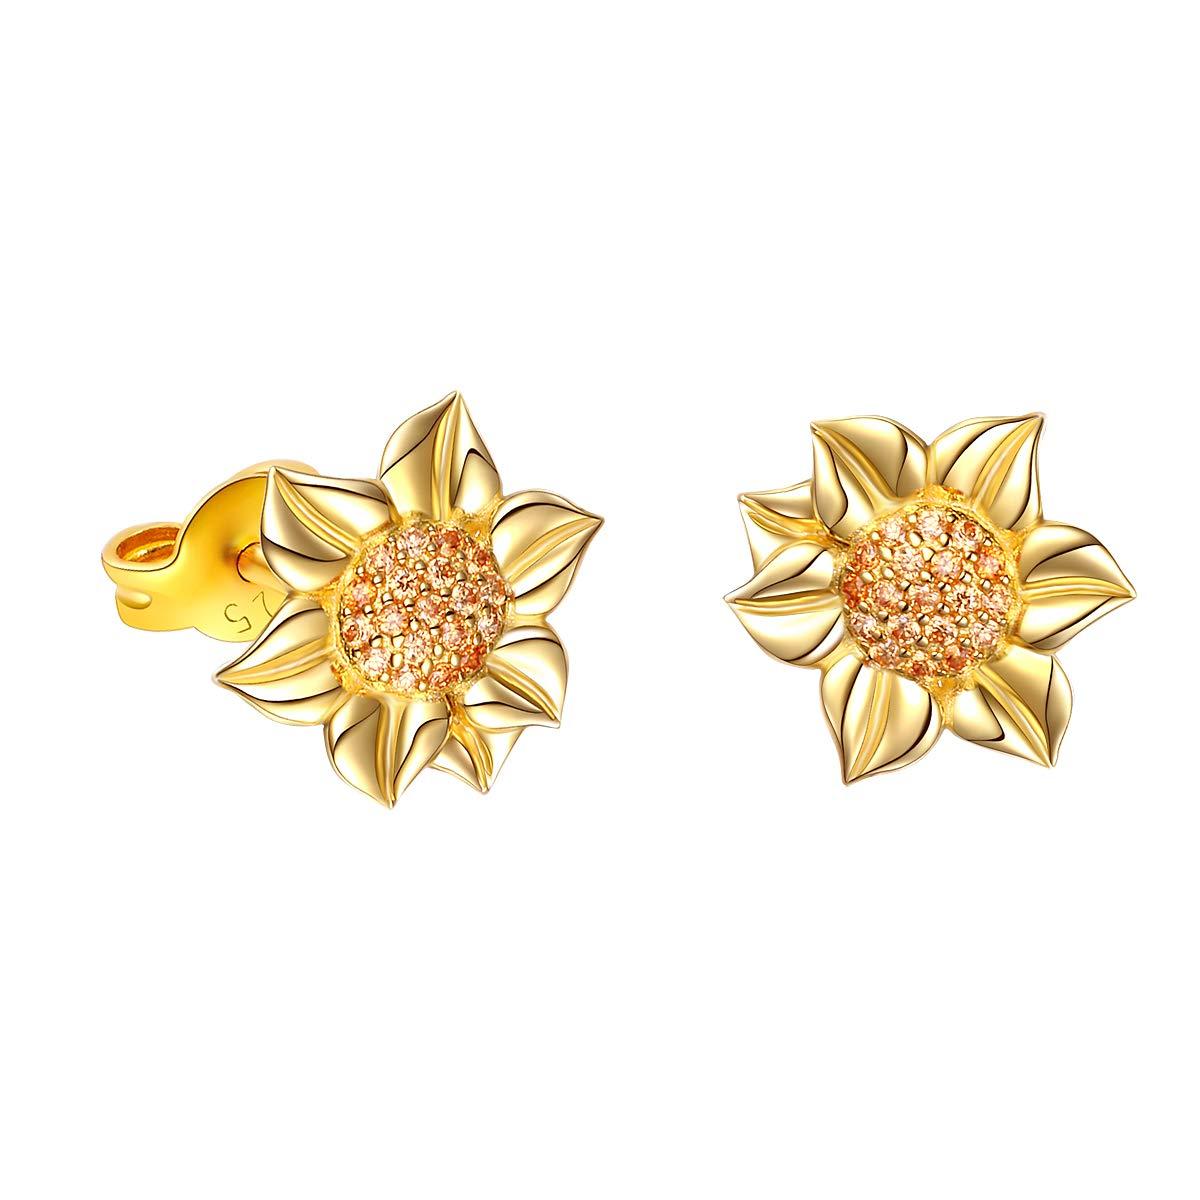 S925 Sterling Silver Sunflower with CZ Pendant Necklace Ring Earrings Bracelet Jewelry Set for Women 18'' (Earrings)